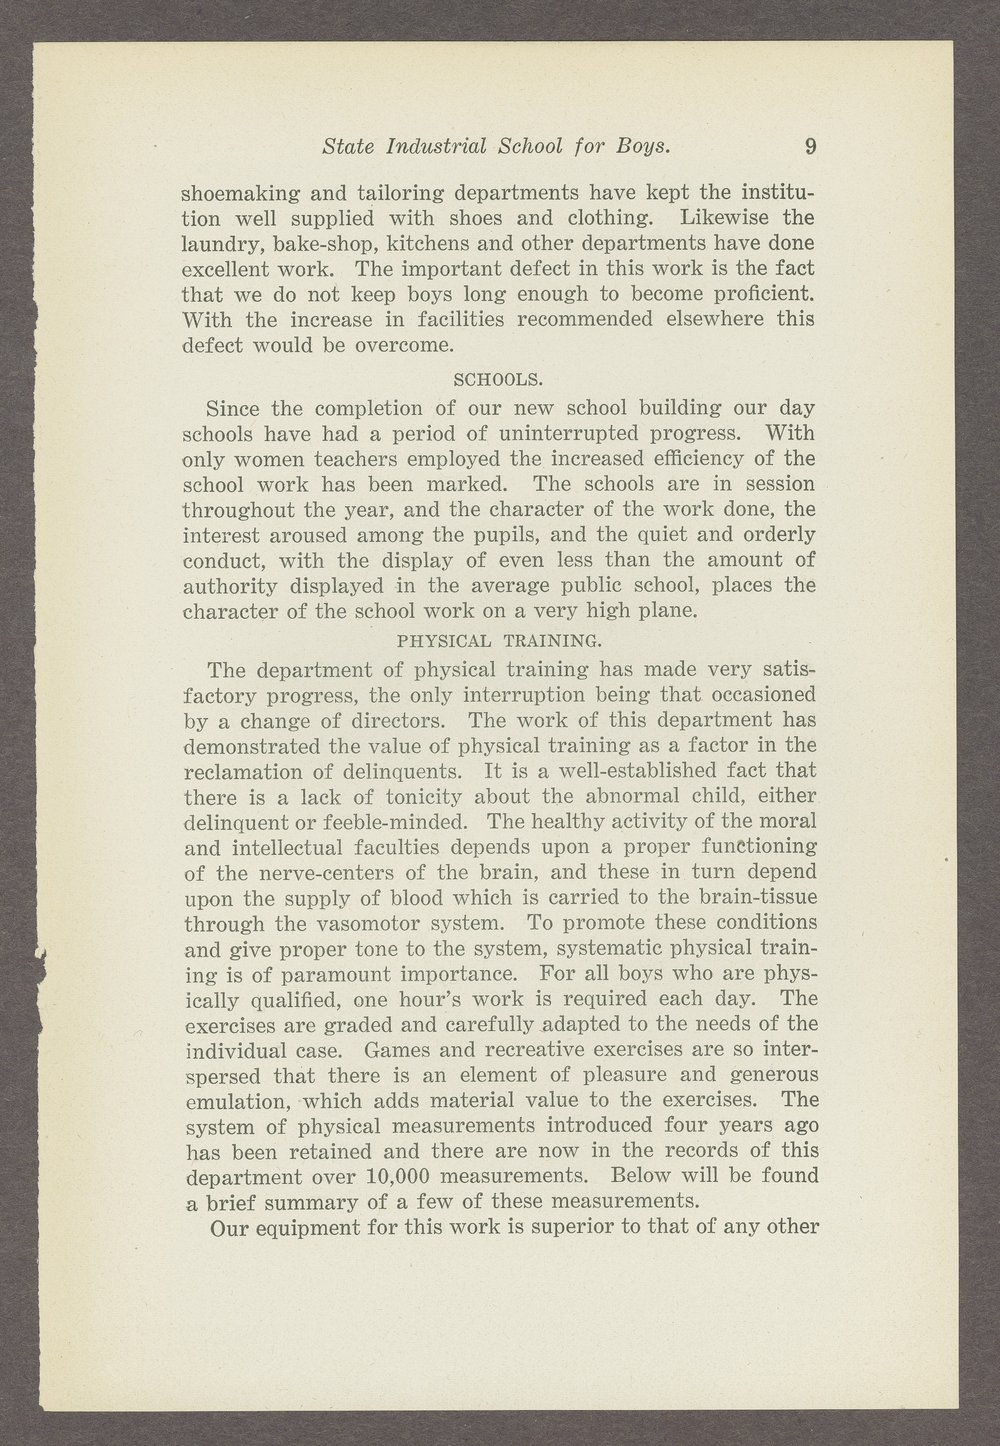 Biennial report of the Boys Industrial School, 1908 - 9